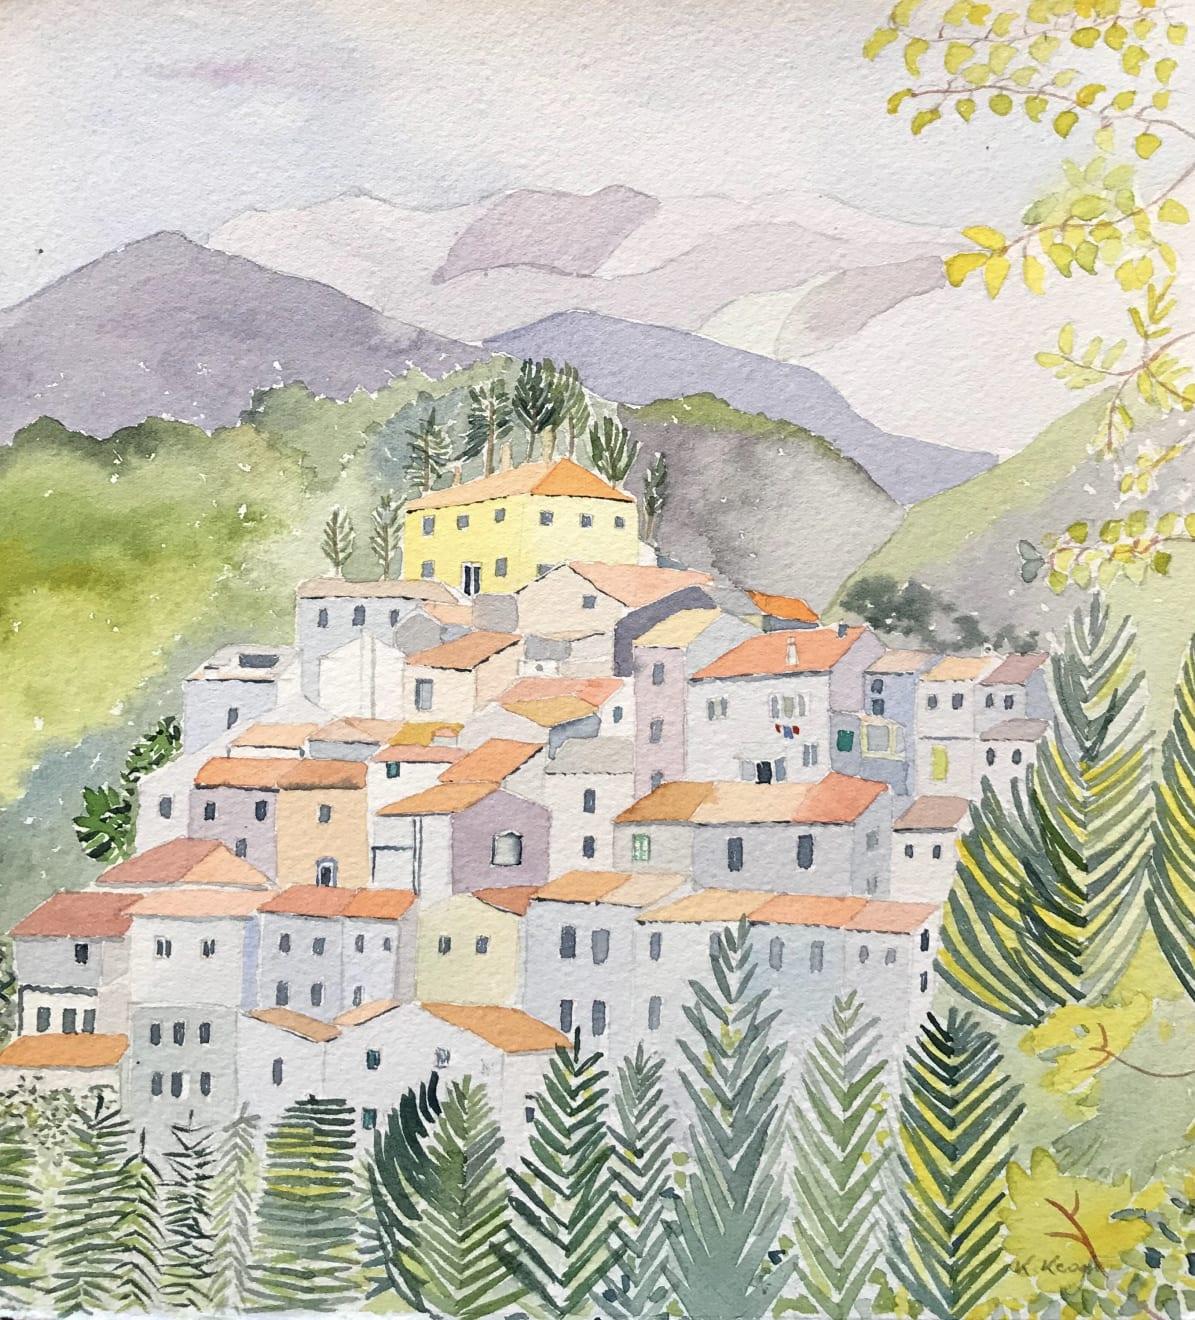 Karen Keogh, Limano, Tuscany